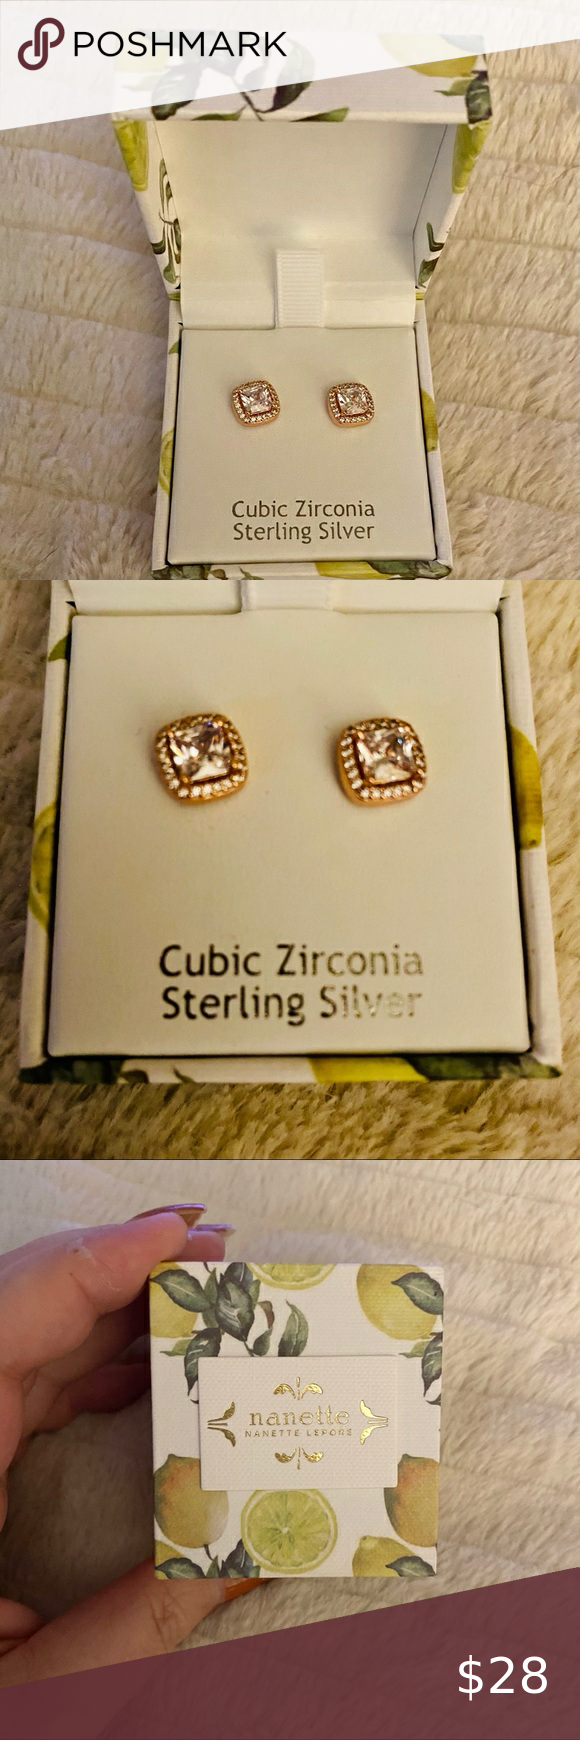 NANETTE LEPORE Cubic Zirconia stud earrings. NEW N